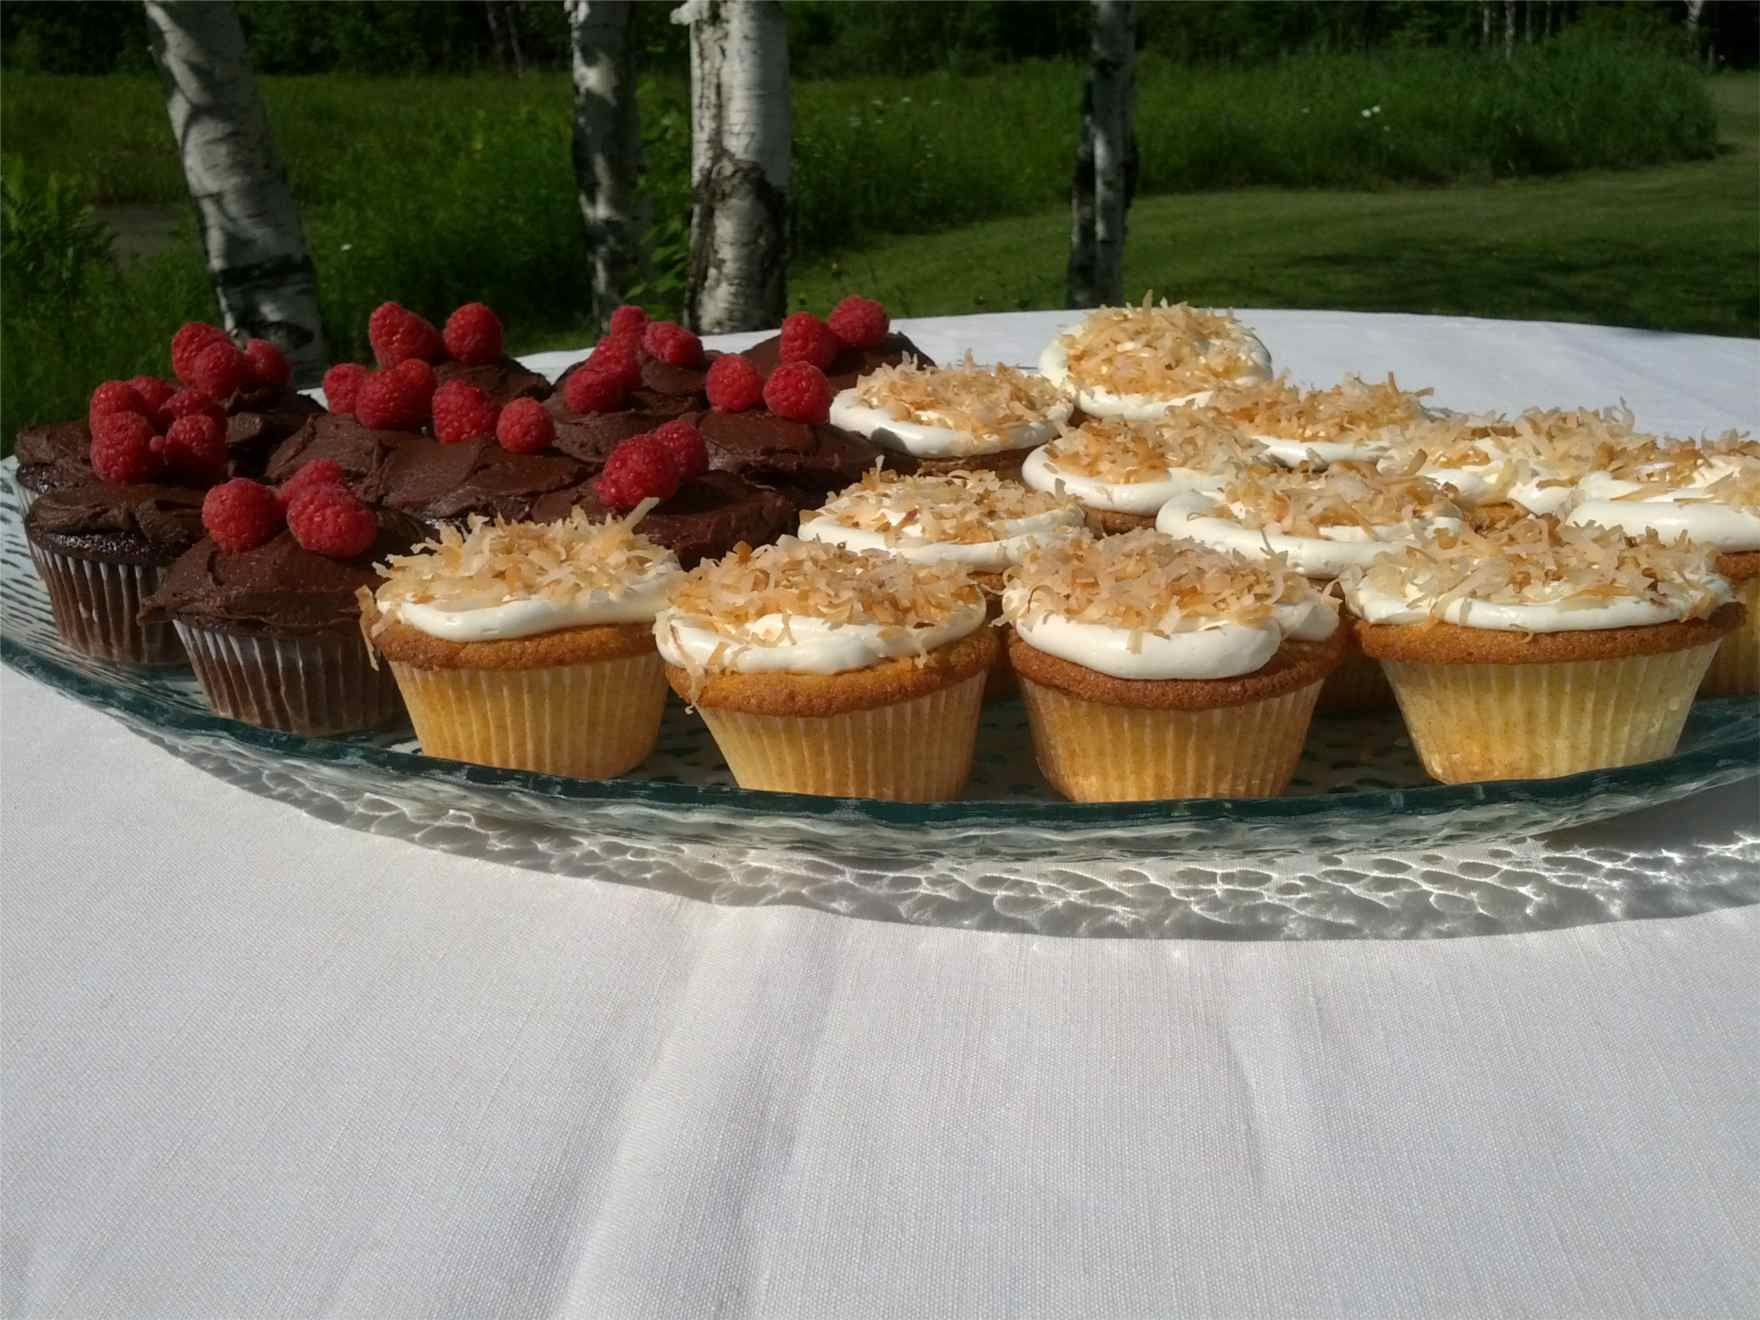 Coconut and chocolate raspberry cupcakes. - Trillium Fine Desserts